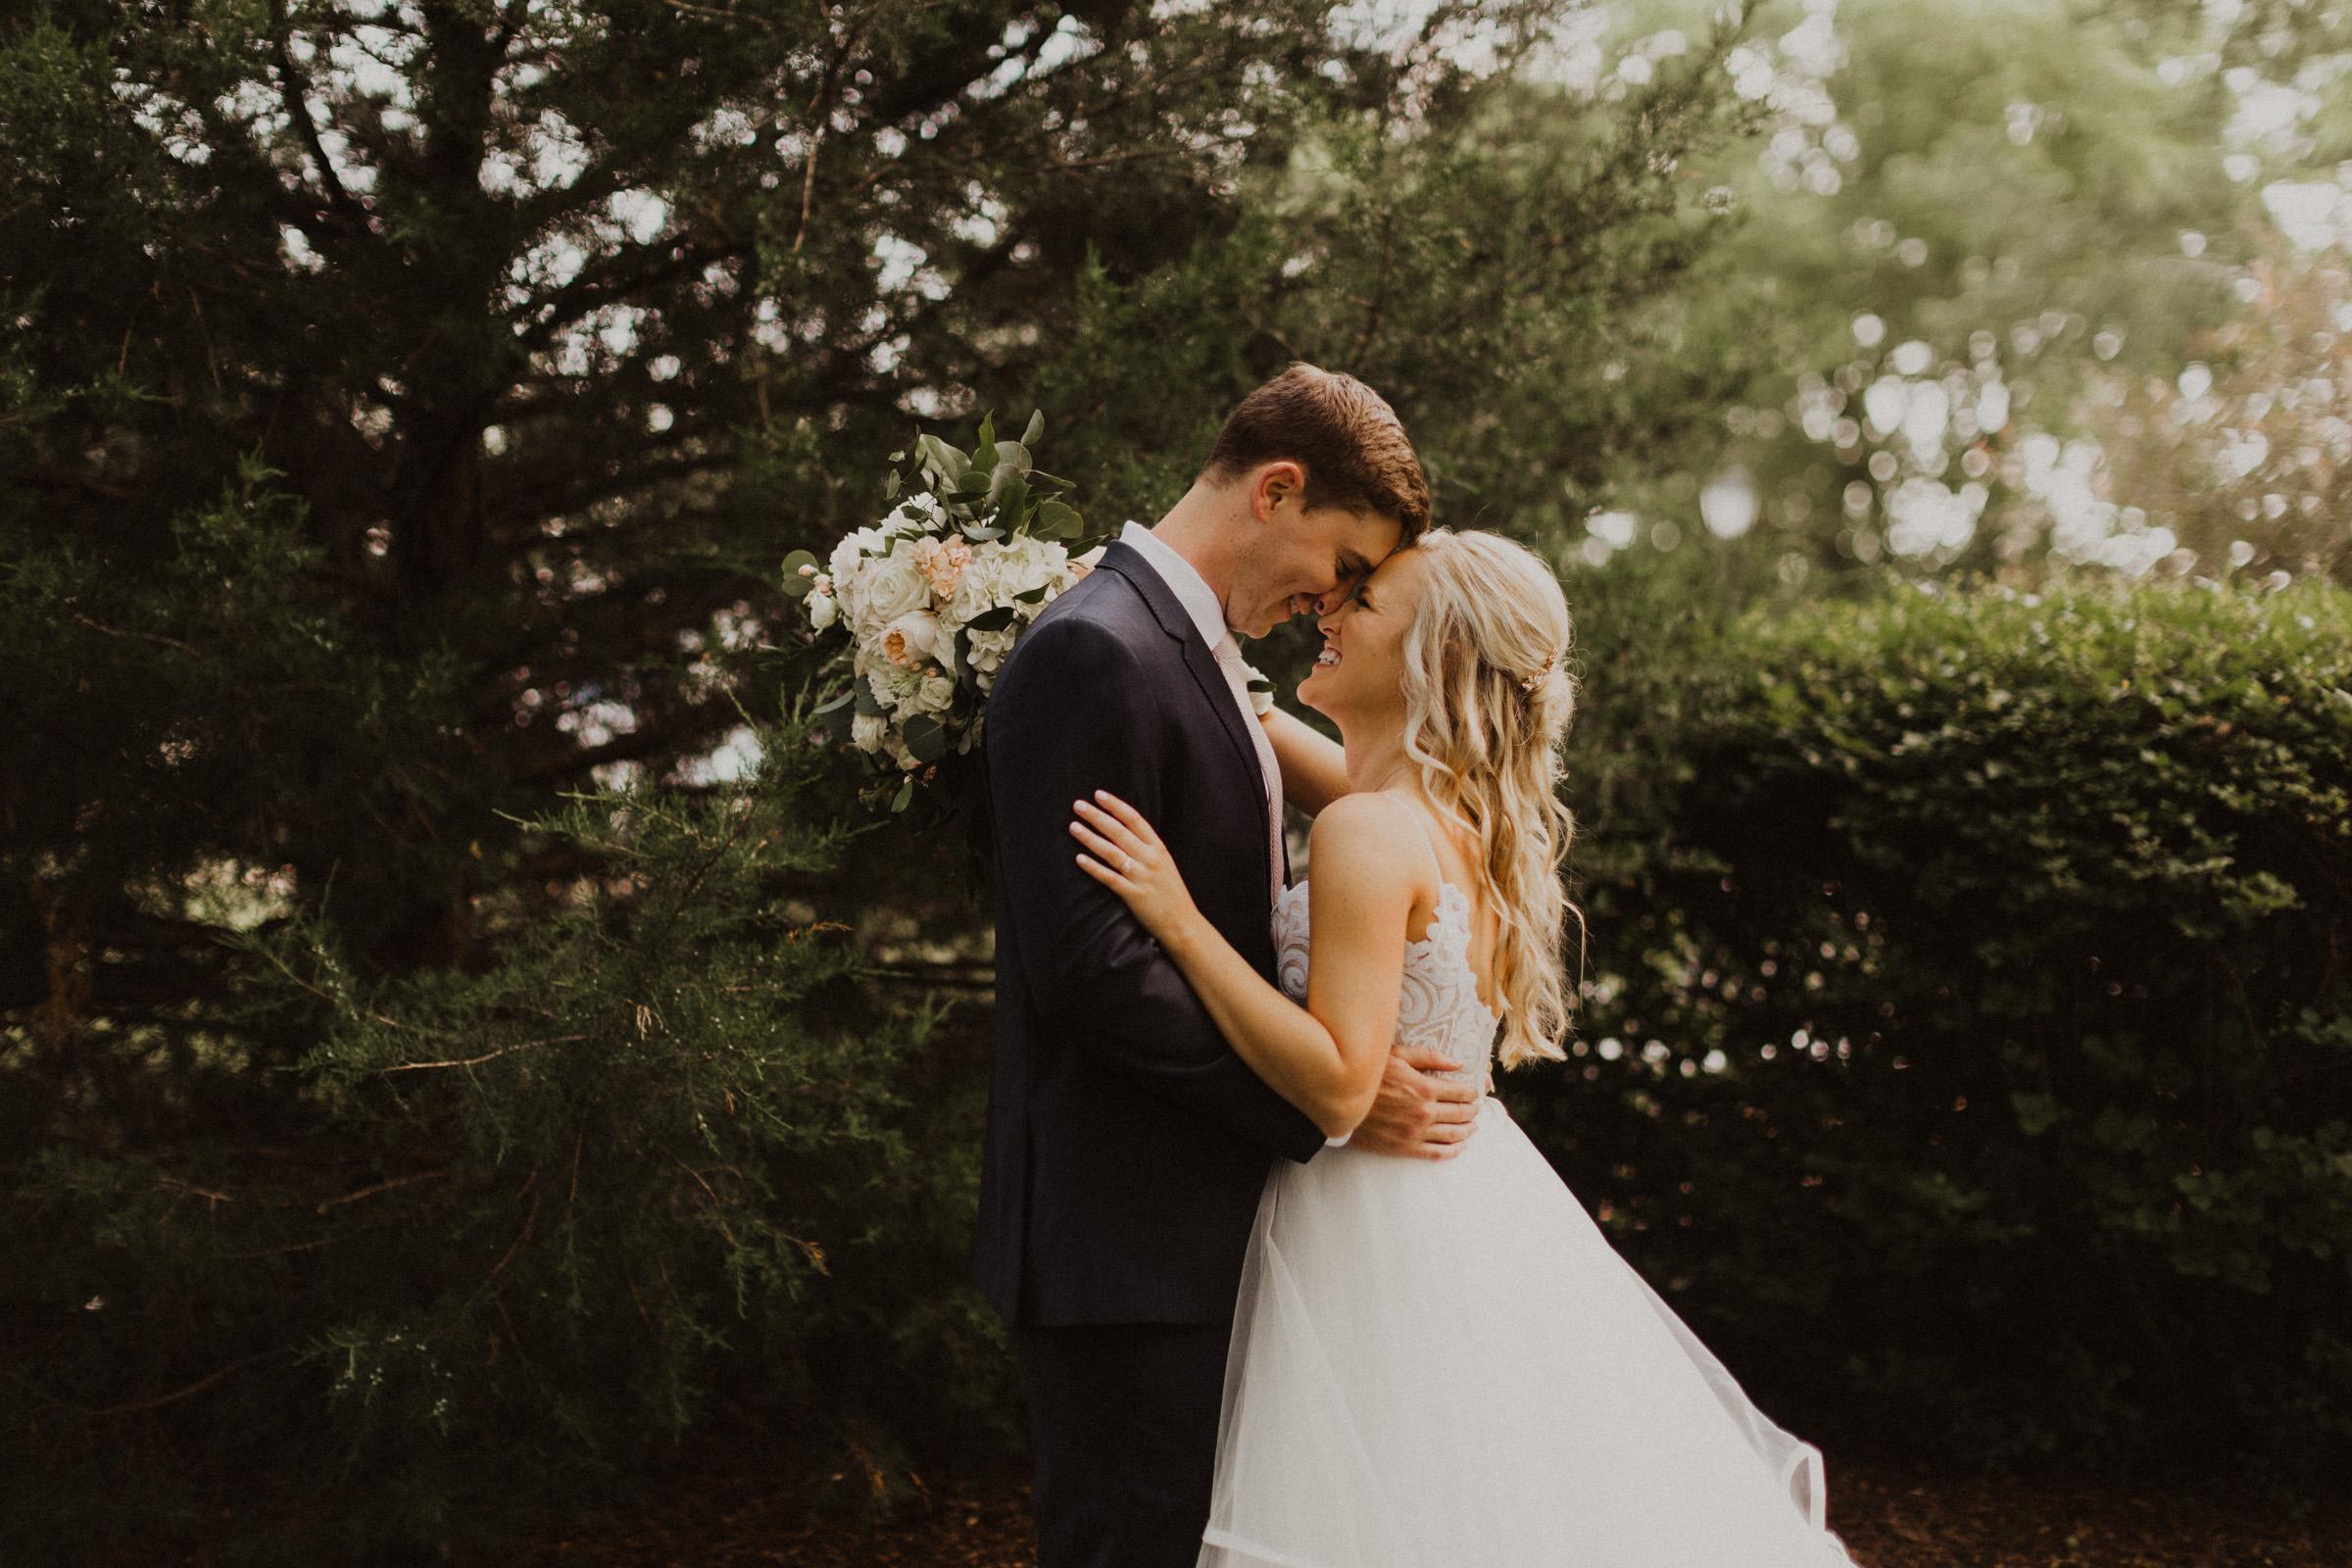 alyssa barletter photography hawthorne house summer outdoor wedding southern charm inspiration-34.jpg